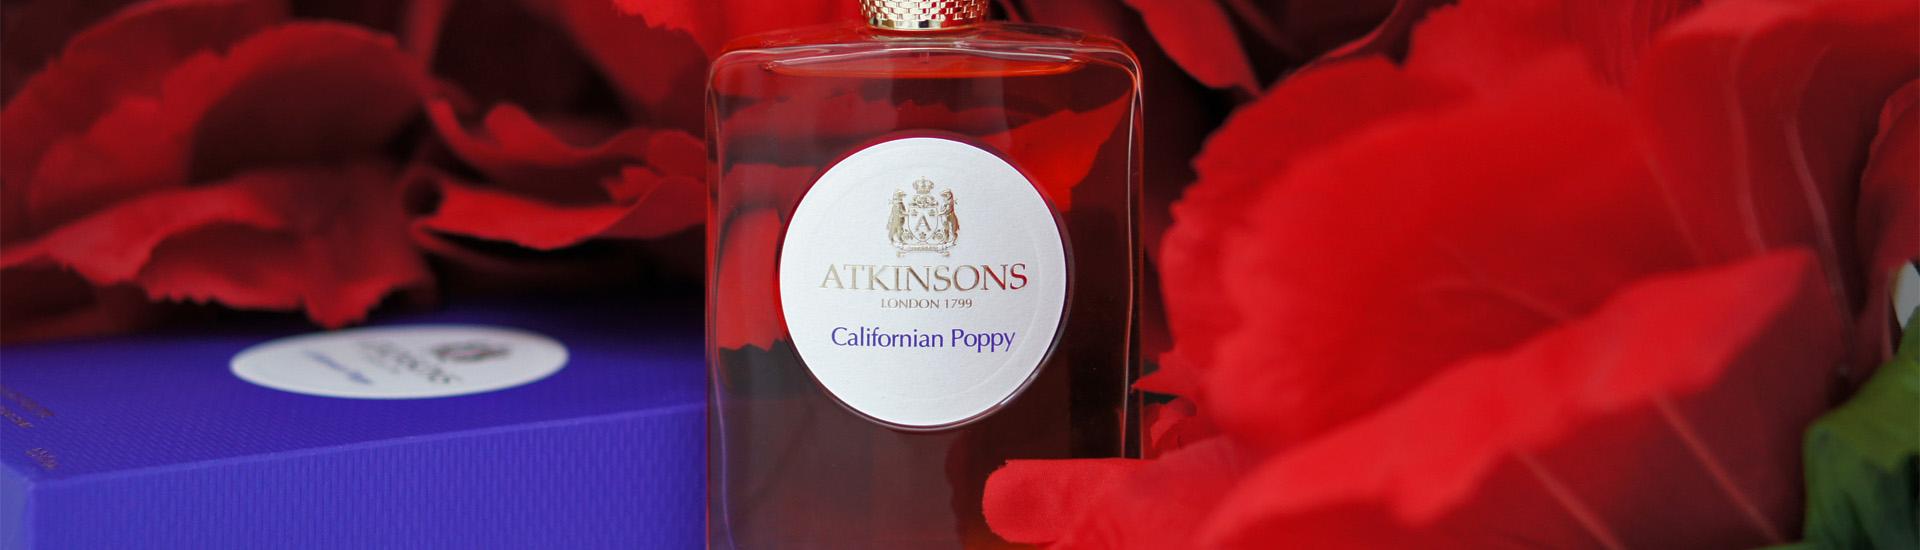 Парфюм модниц прошлого: Atkinsons Californian Poppy